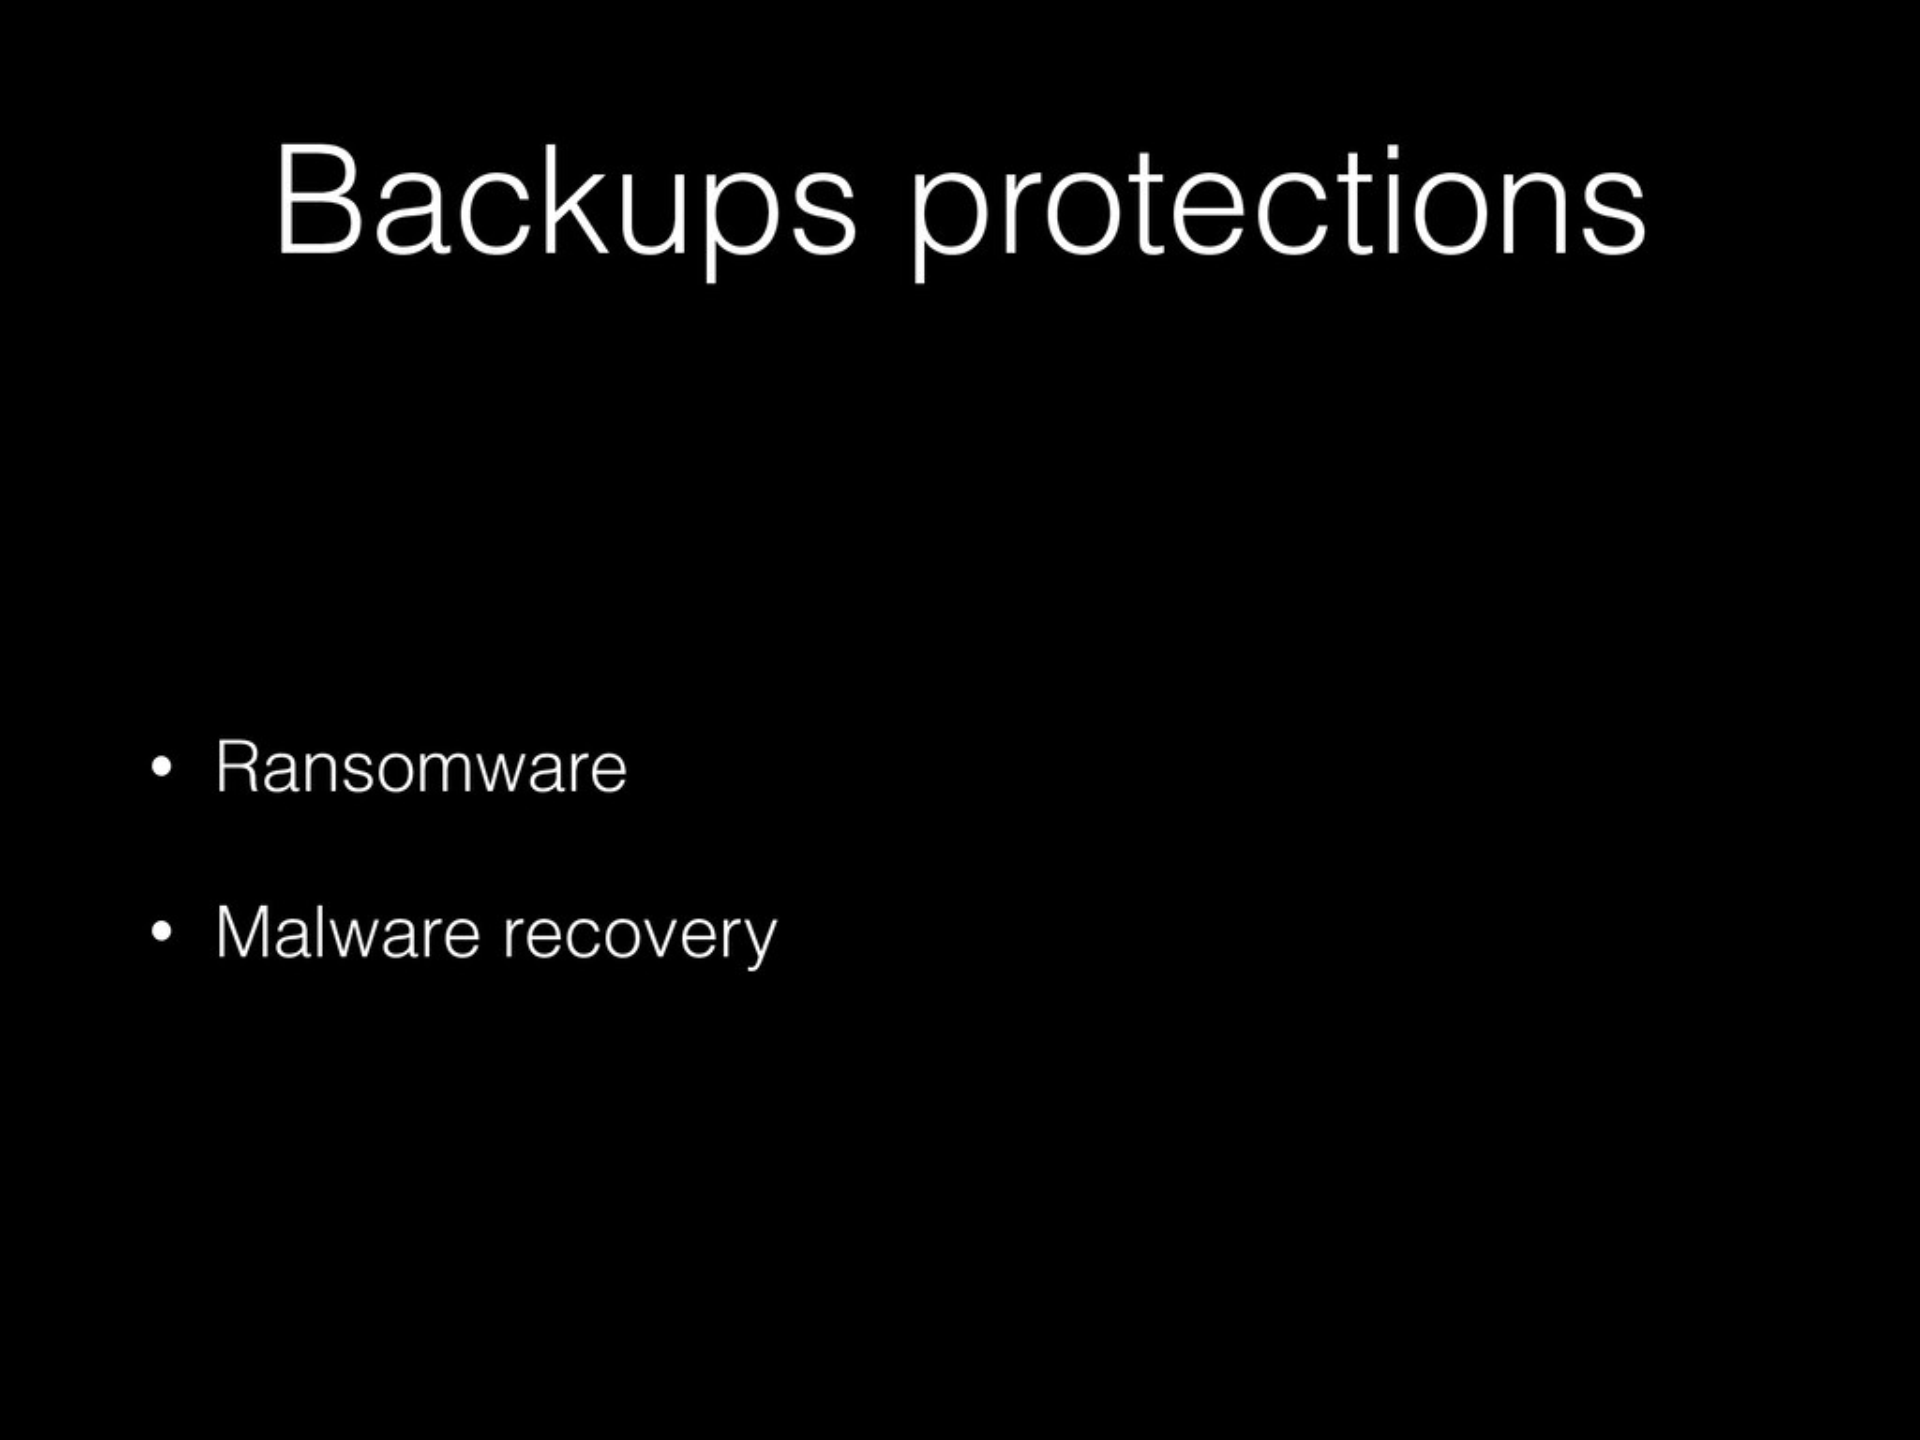 Backups protections • Ransomware • Malware reco...